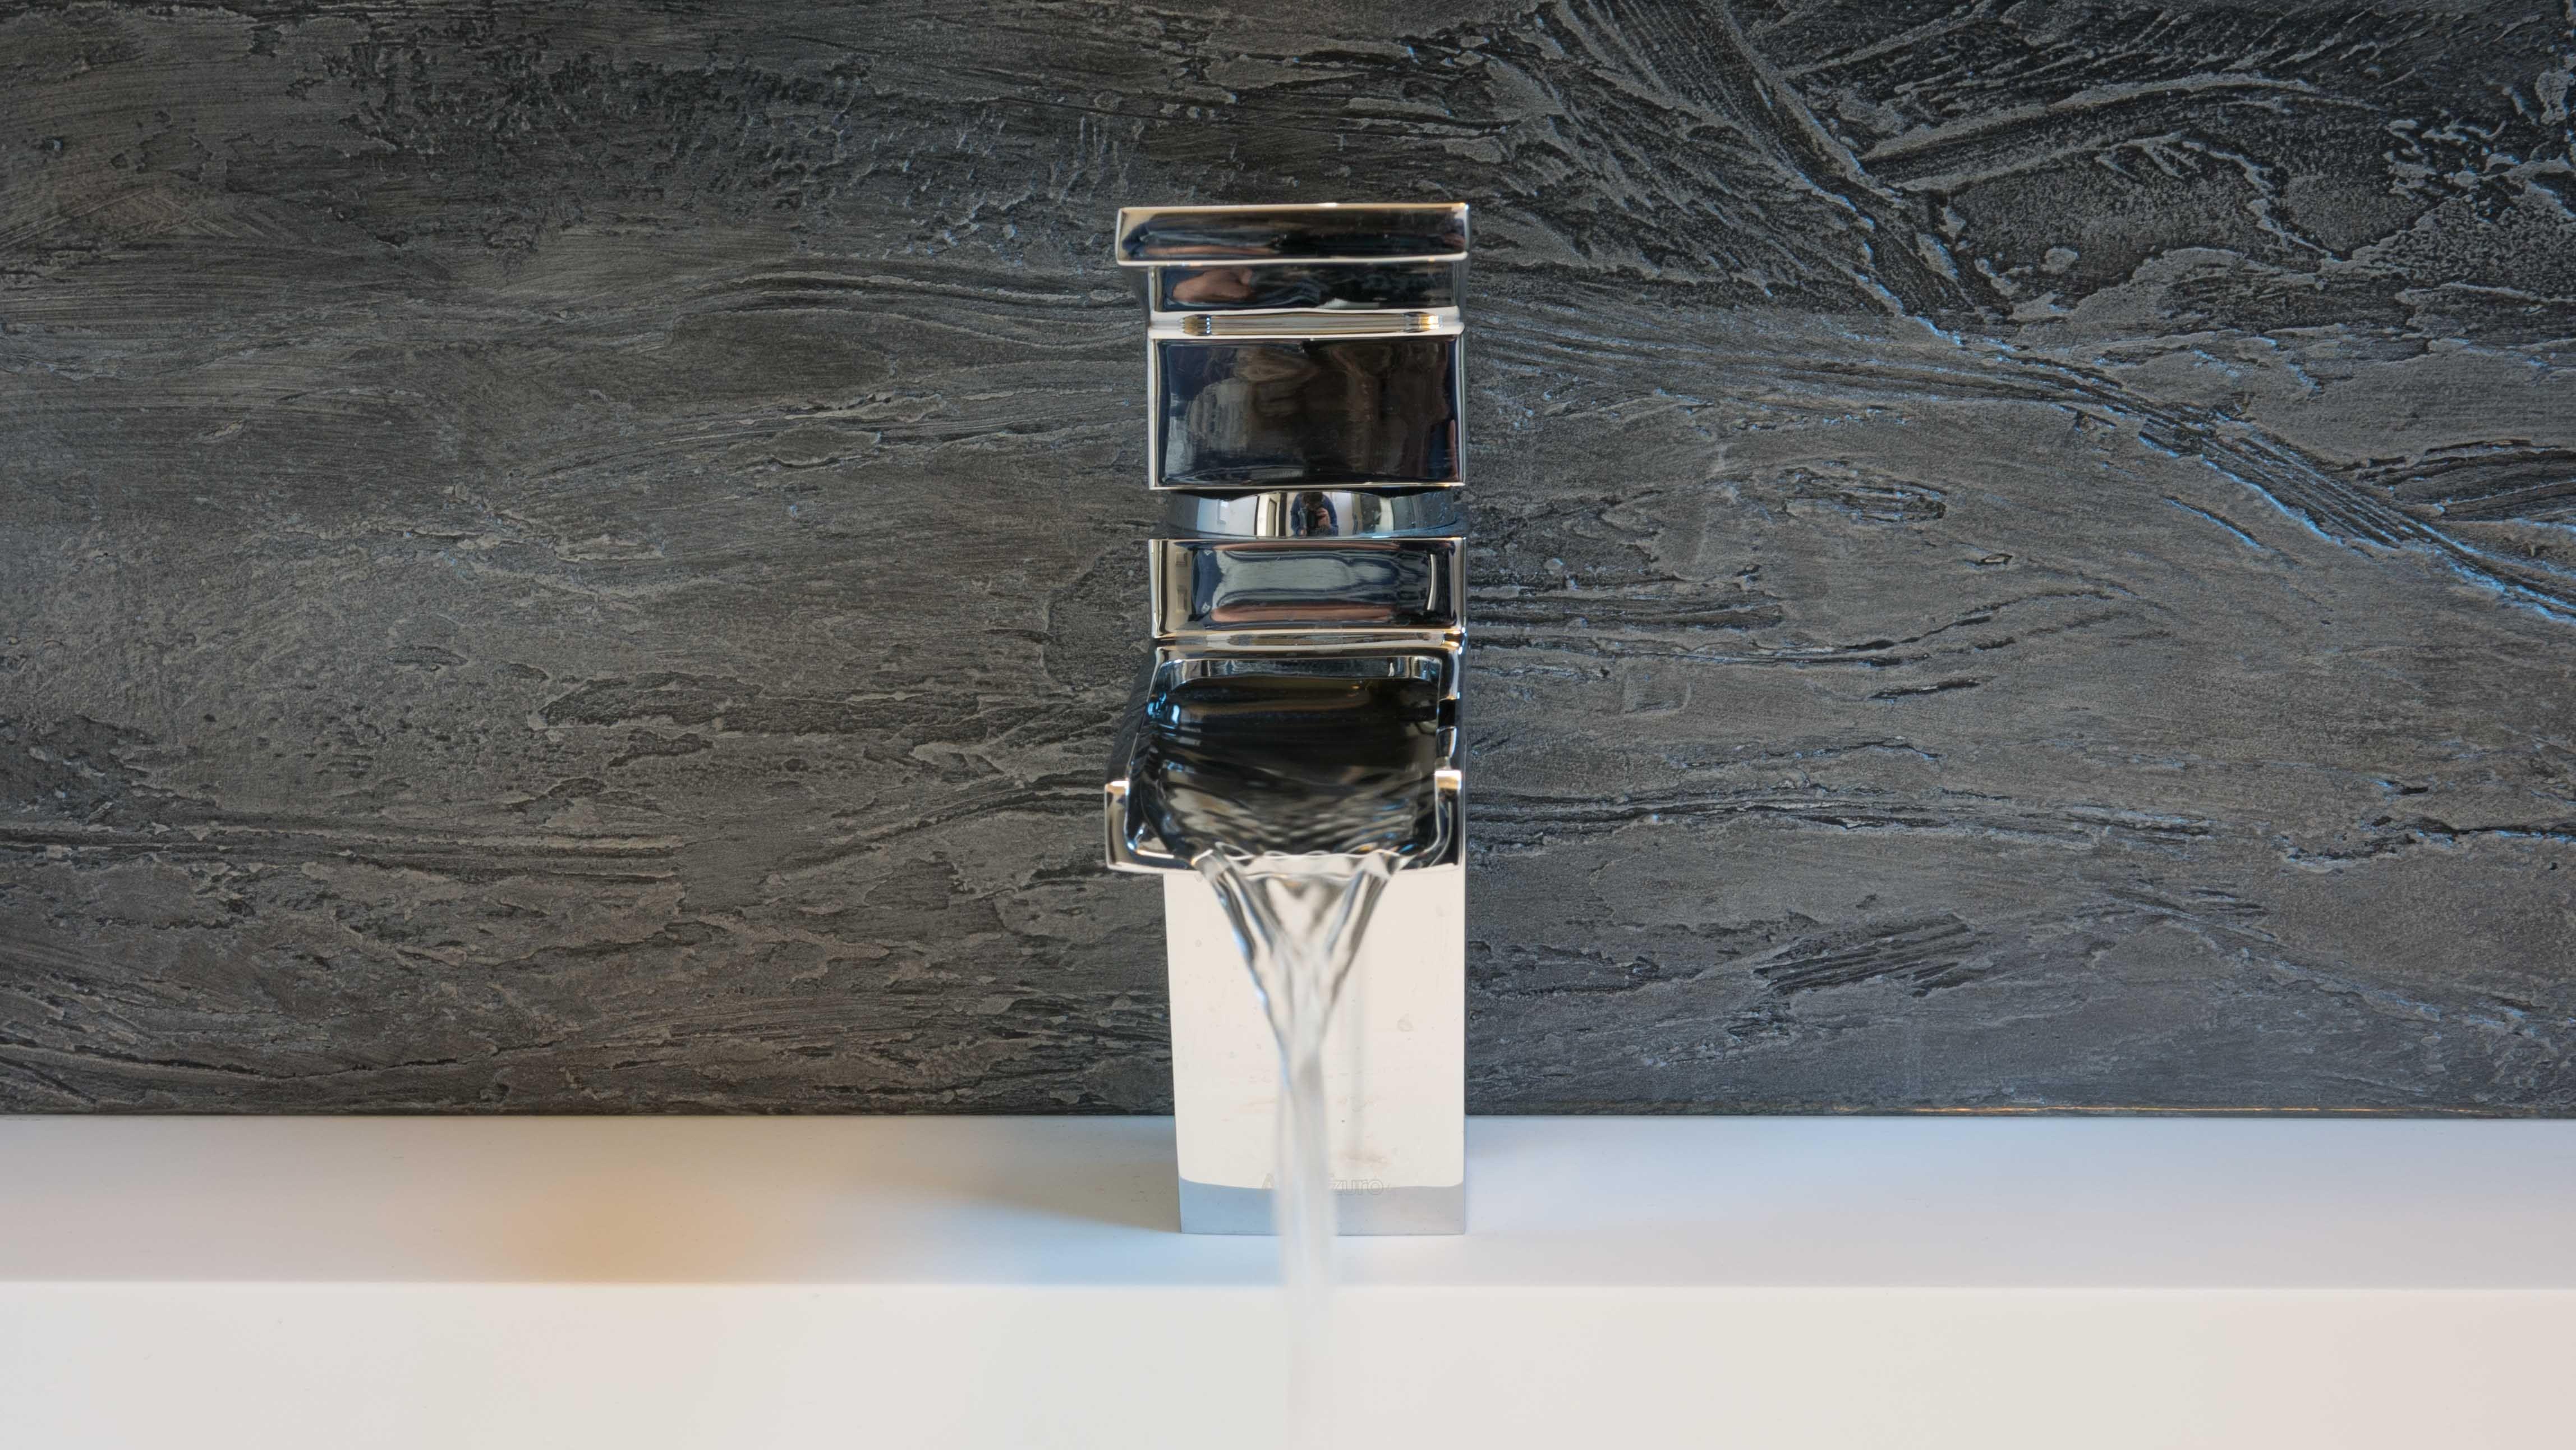 Betonstuc kalk co artcollection kalk co betonstuc